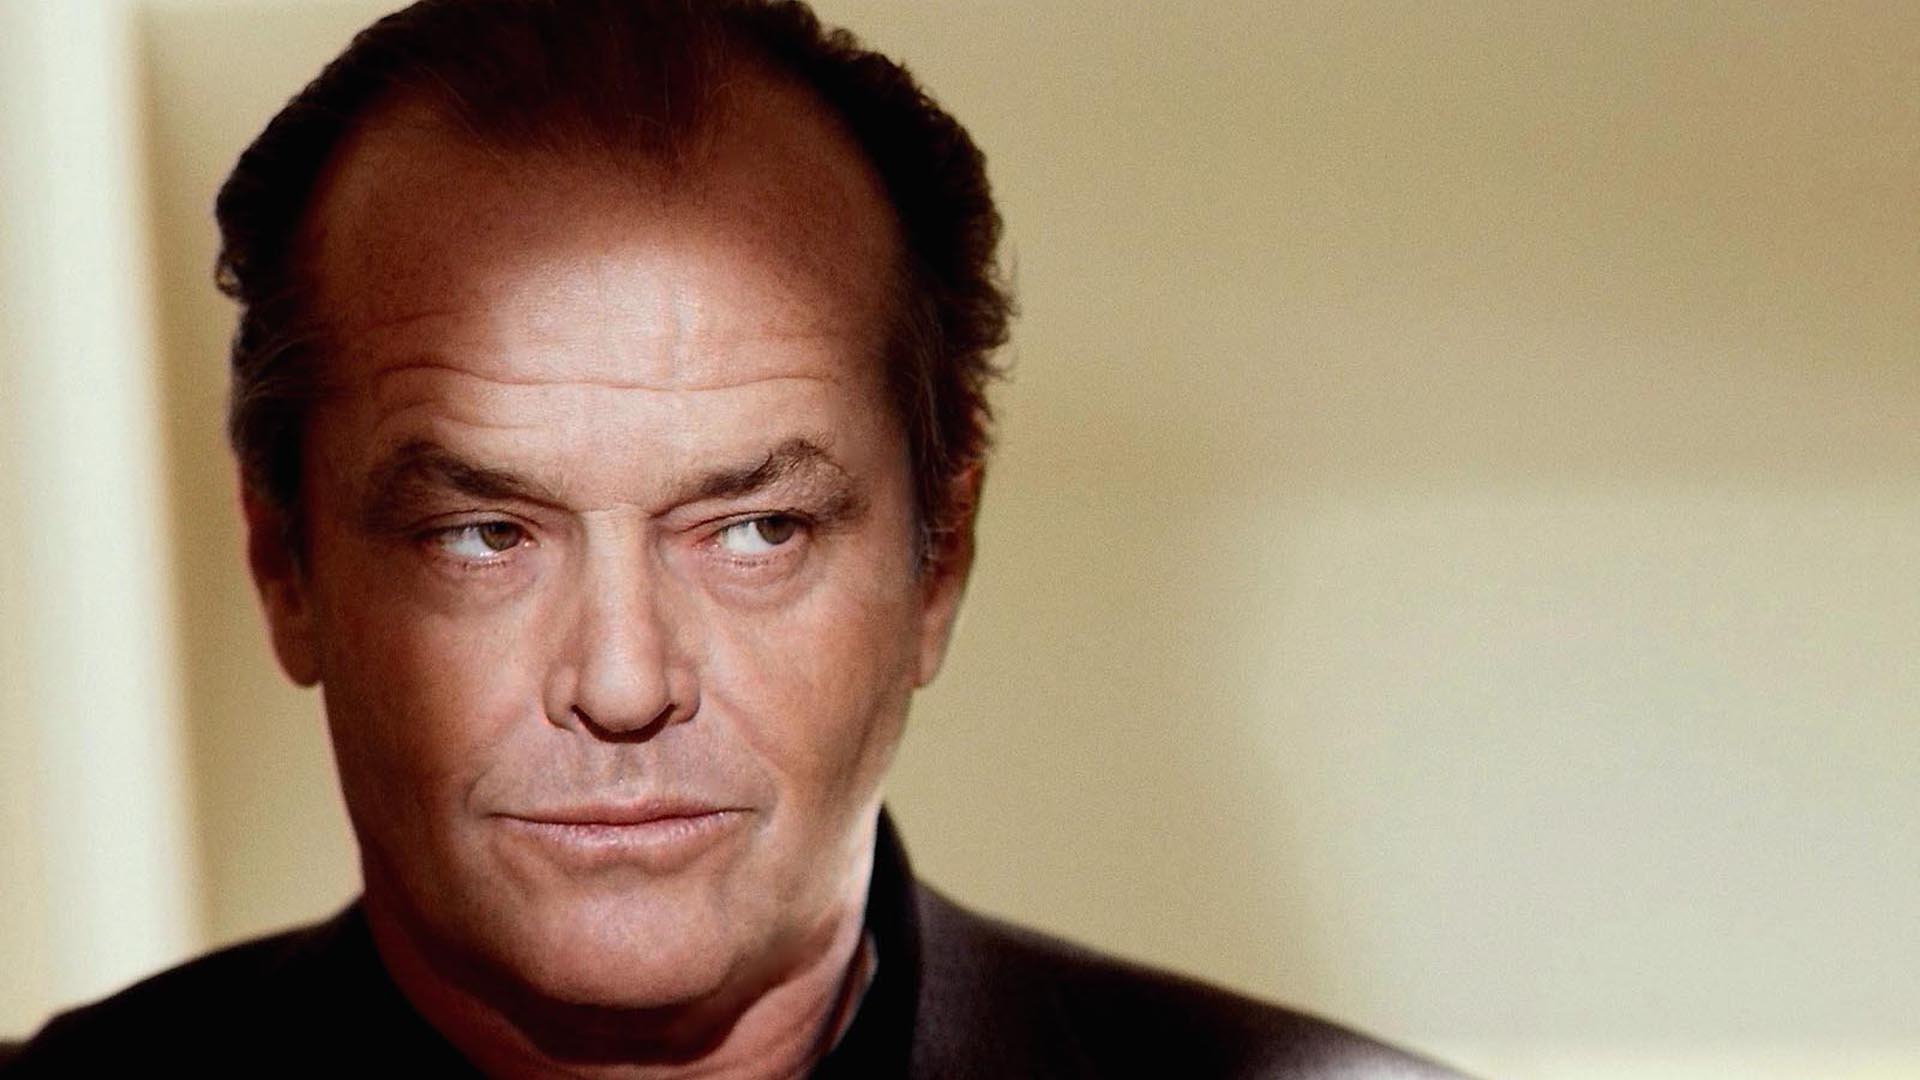 Jack Nicholson For Desktop